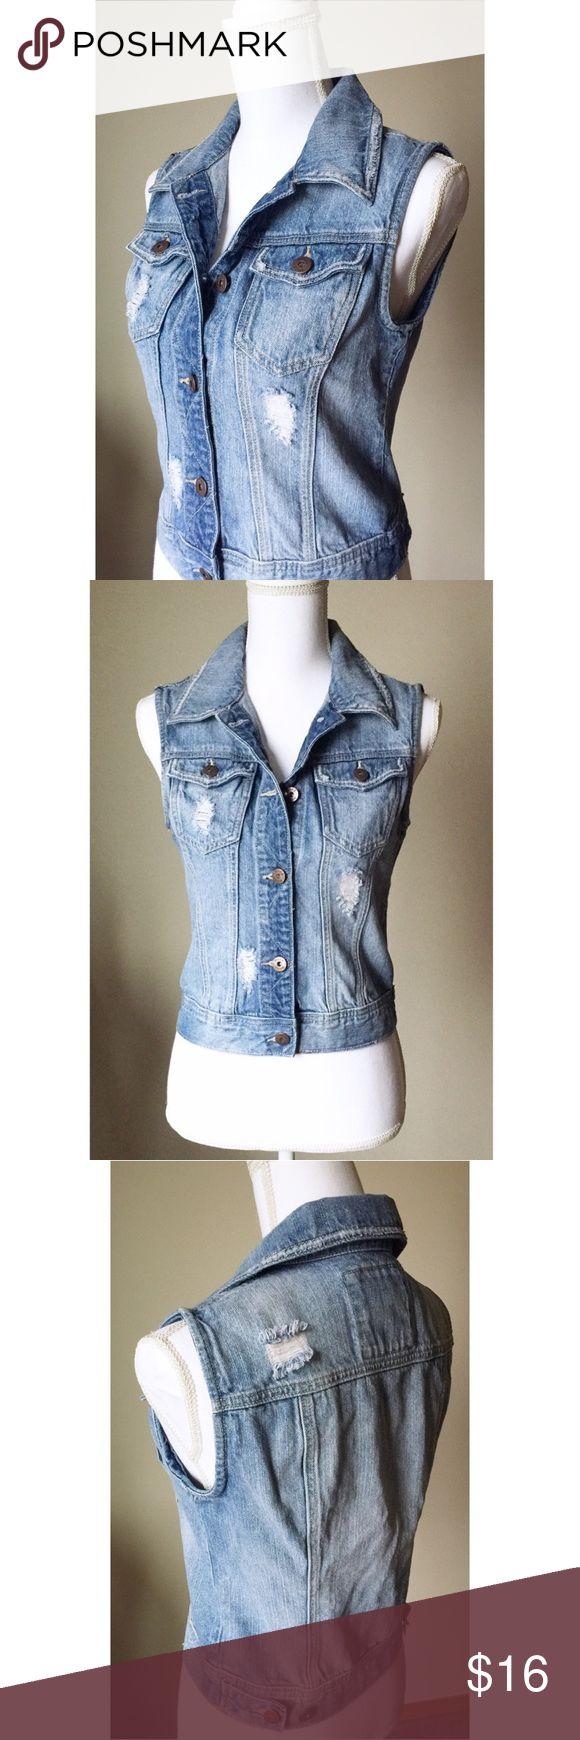 Sleeveless Denim Jacket Distressed sleeveless jean jacket. NWOT. Jackets & Coats Jean Jackets